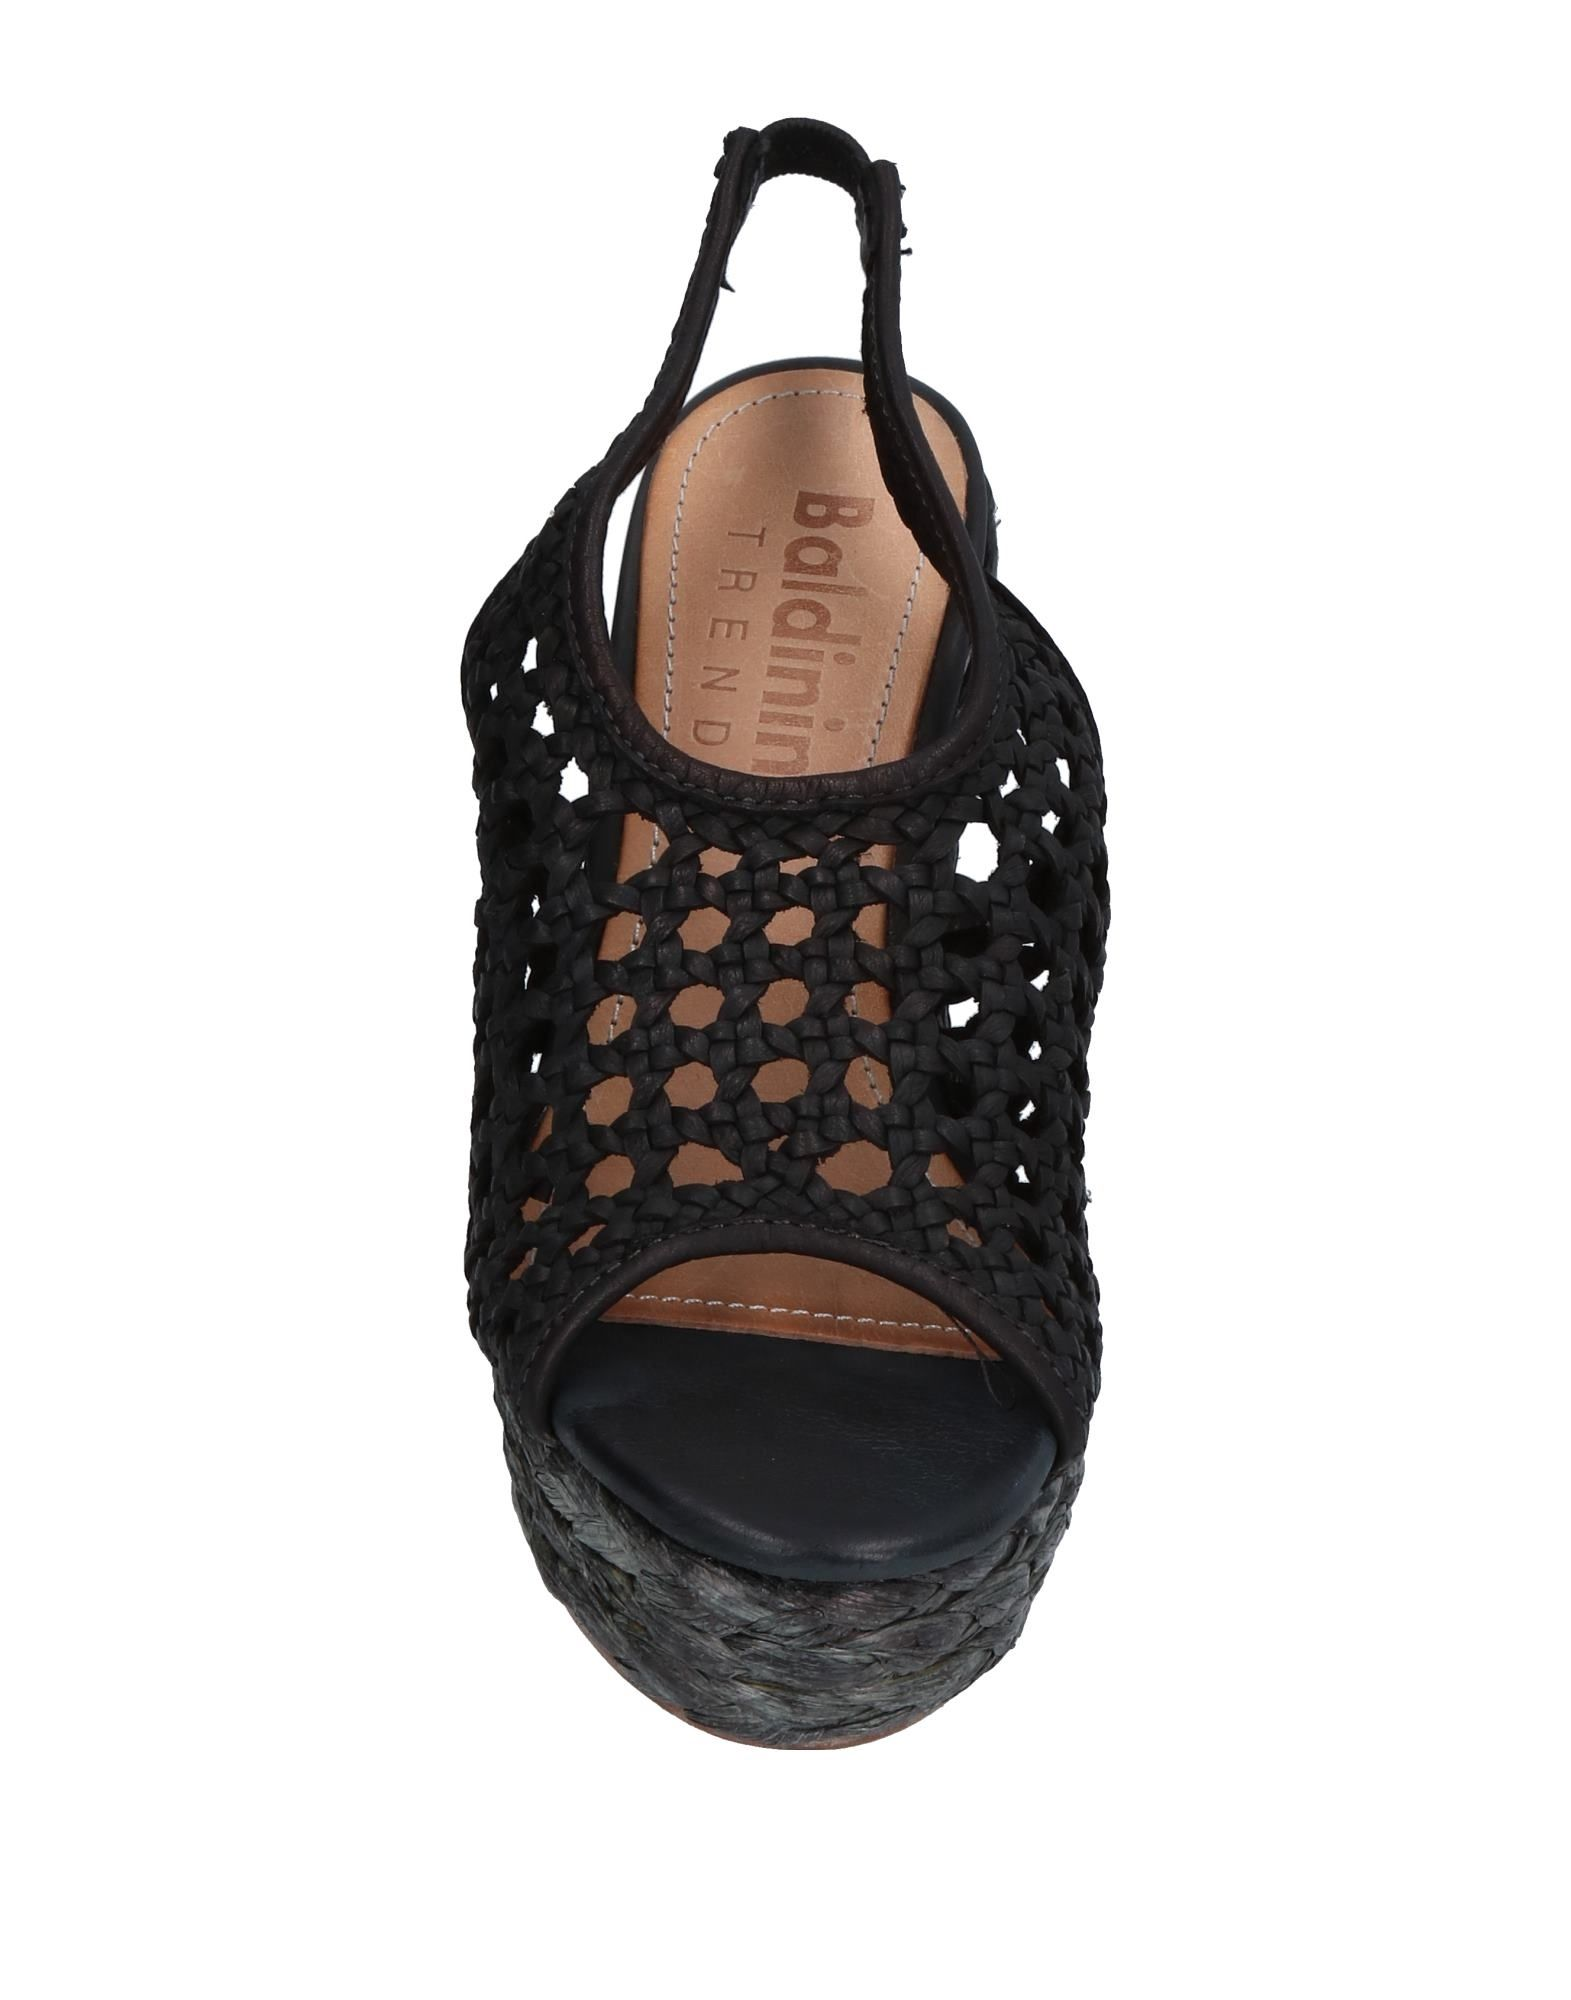 Baldinini 11107868BI Trend Sandalen Damen  11107868BI Baldinini Gute Qualität beliebte Schuhe 43cd5d